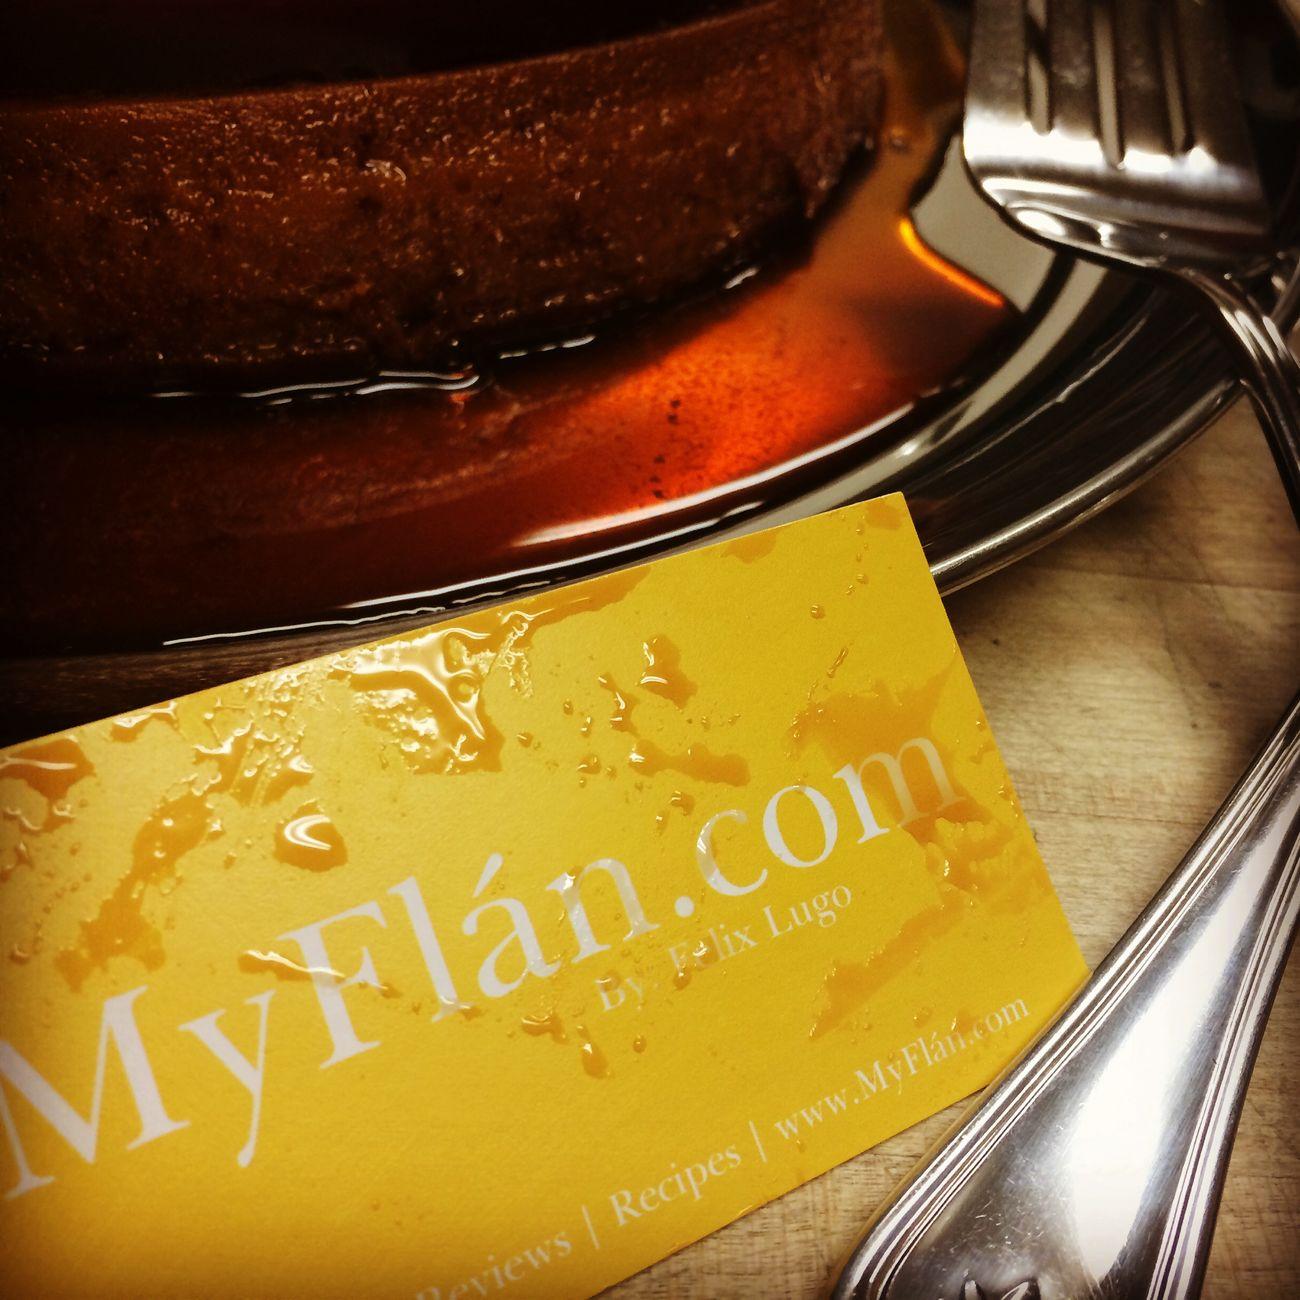 Pudim Flan Bakery Myflan Desserts Dessert Sugar Food Foodporn Ratemyflan